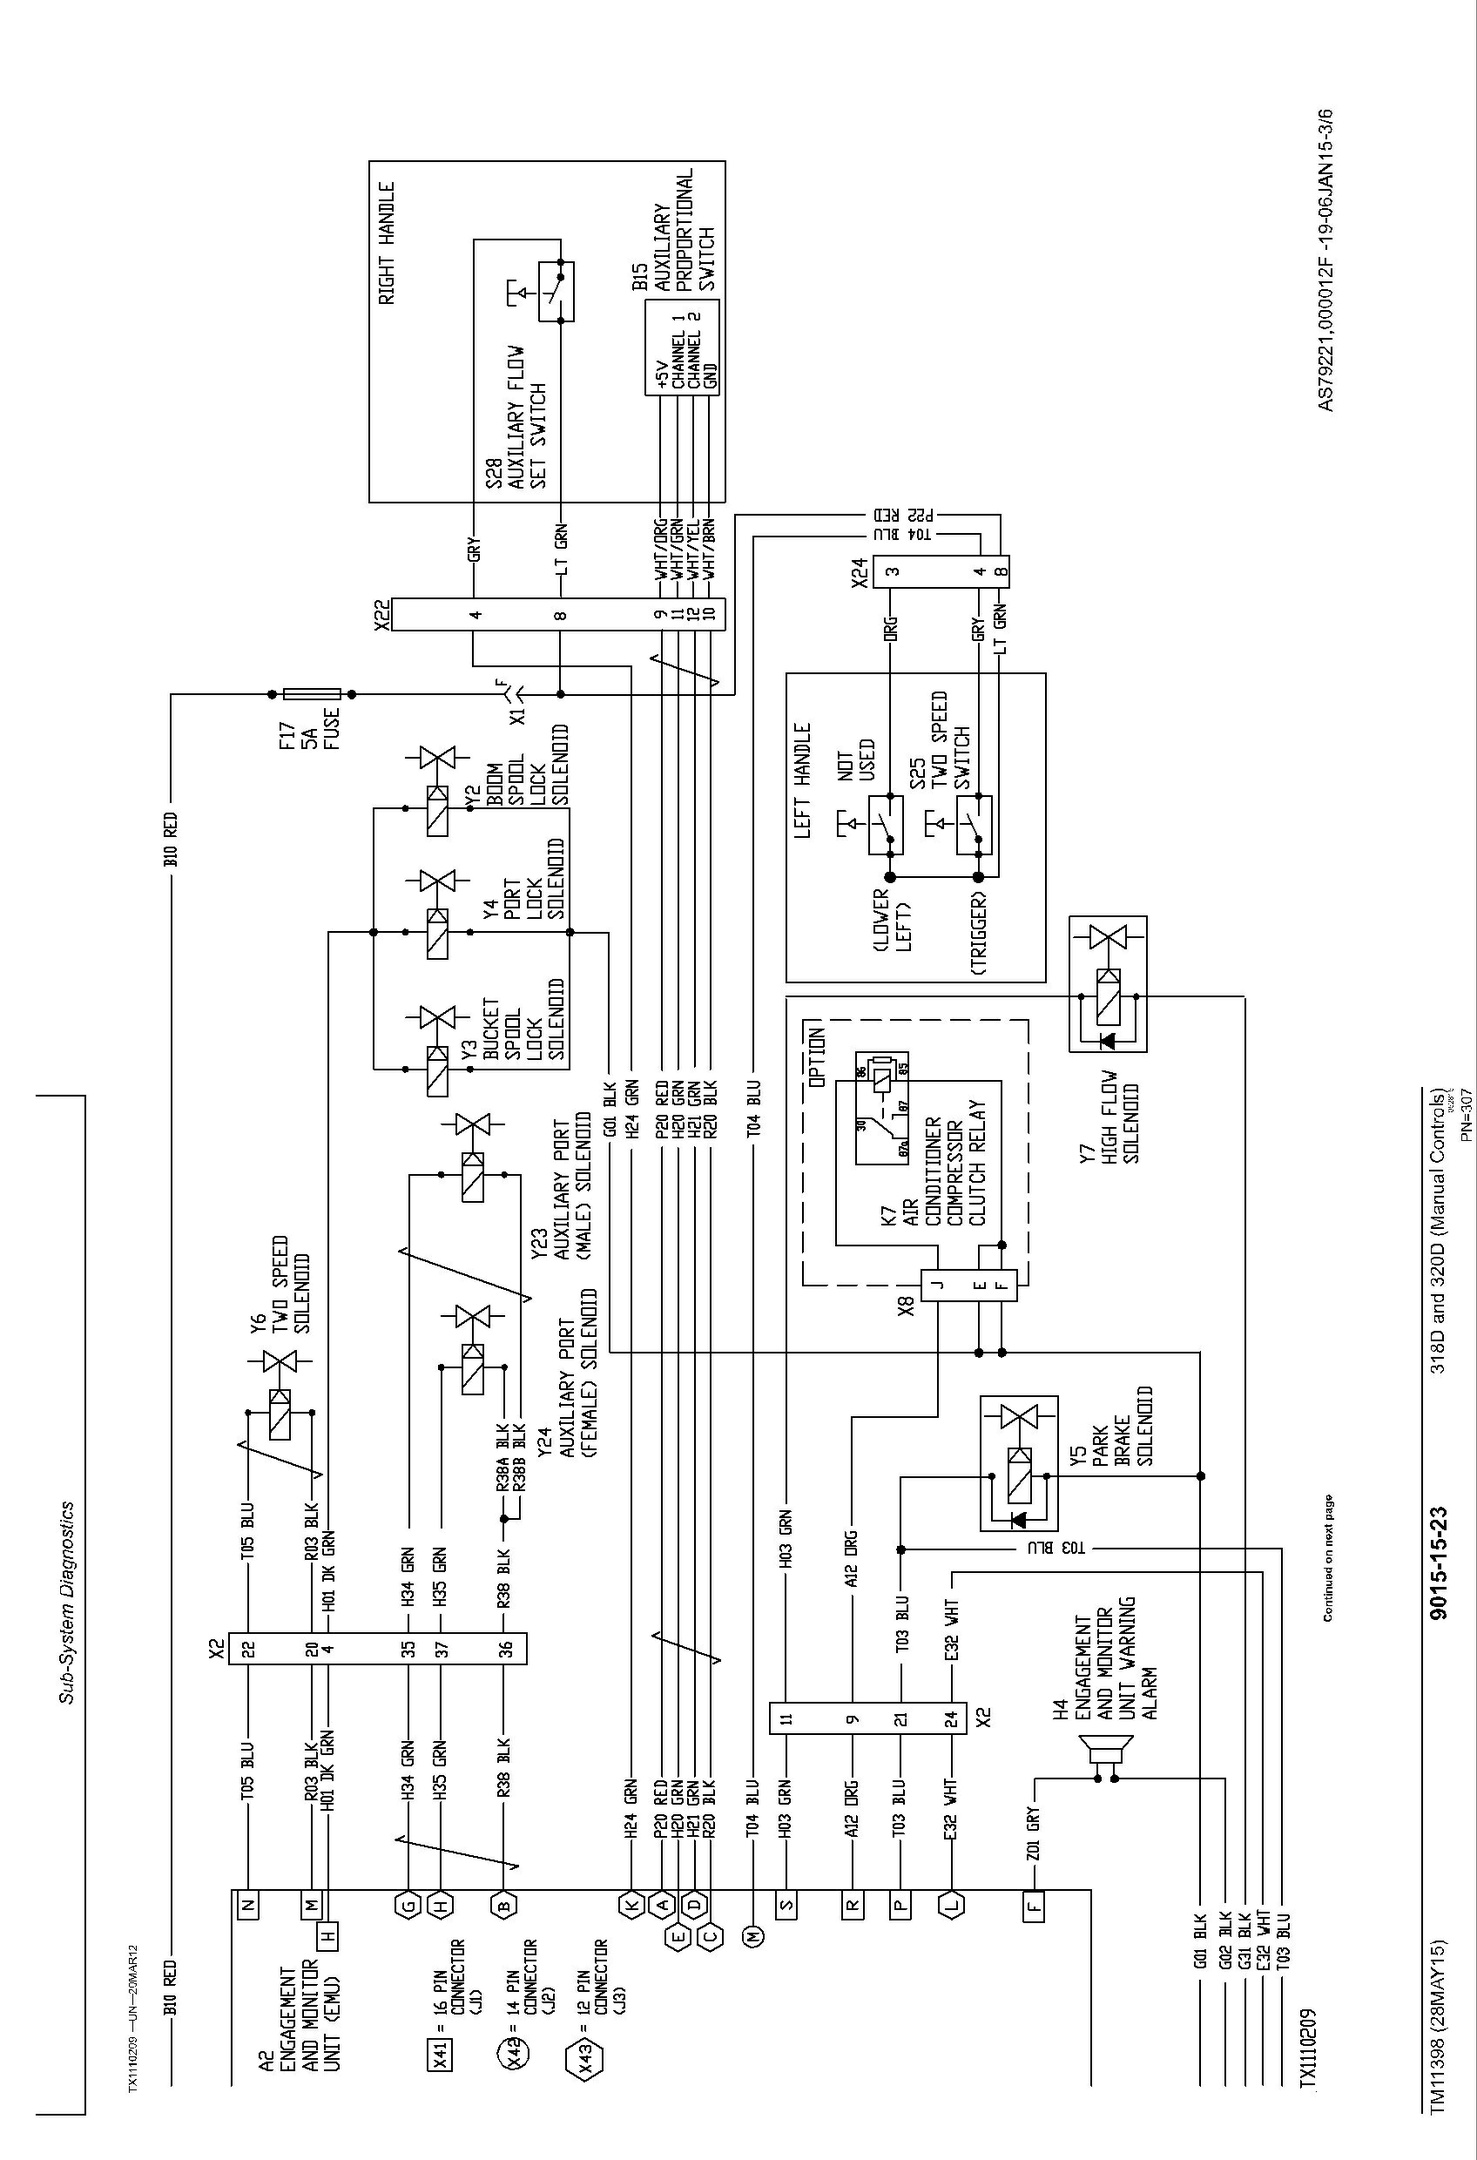 John Deere 2040 Hydraulic System | www.topsimages.com on jd 8430 hydraulic schematic, brake schematic diagram, jd hydraulic steering schematic,